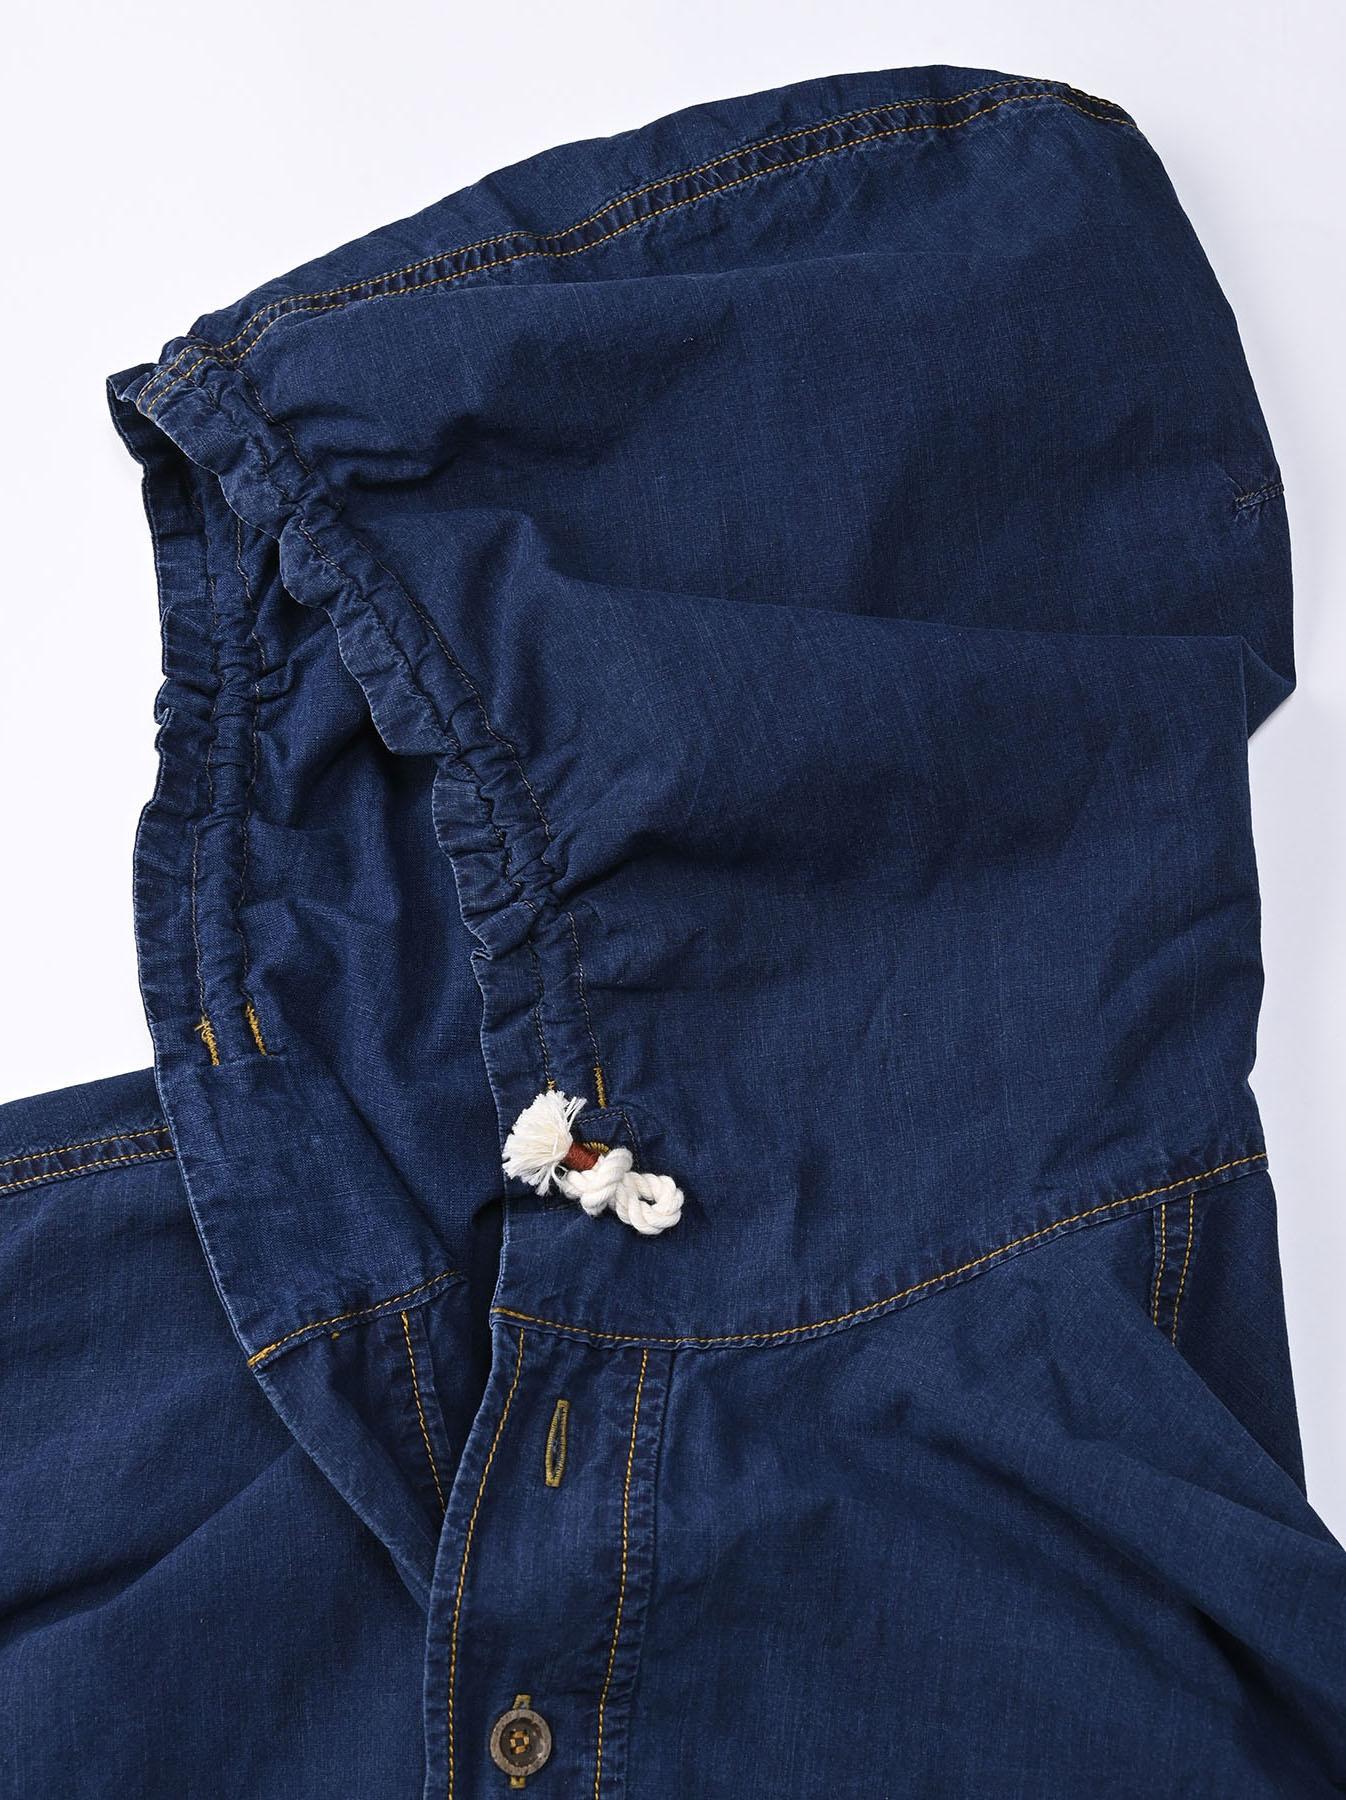 Indigo Tapet Damo Cotton On The Beach Hoodie Shirt-11